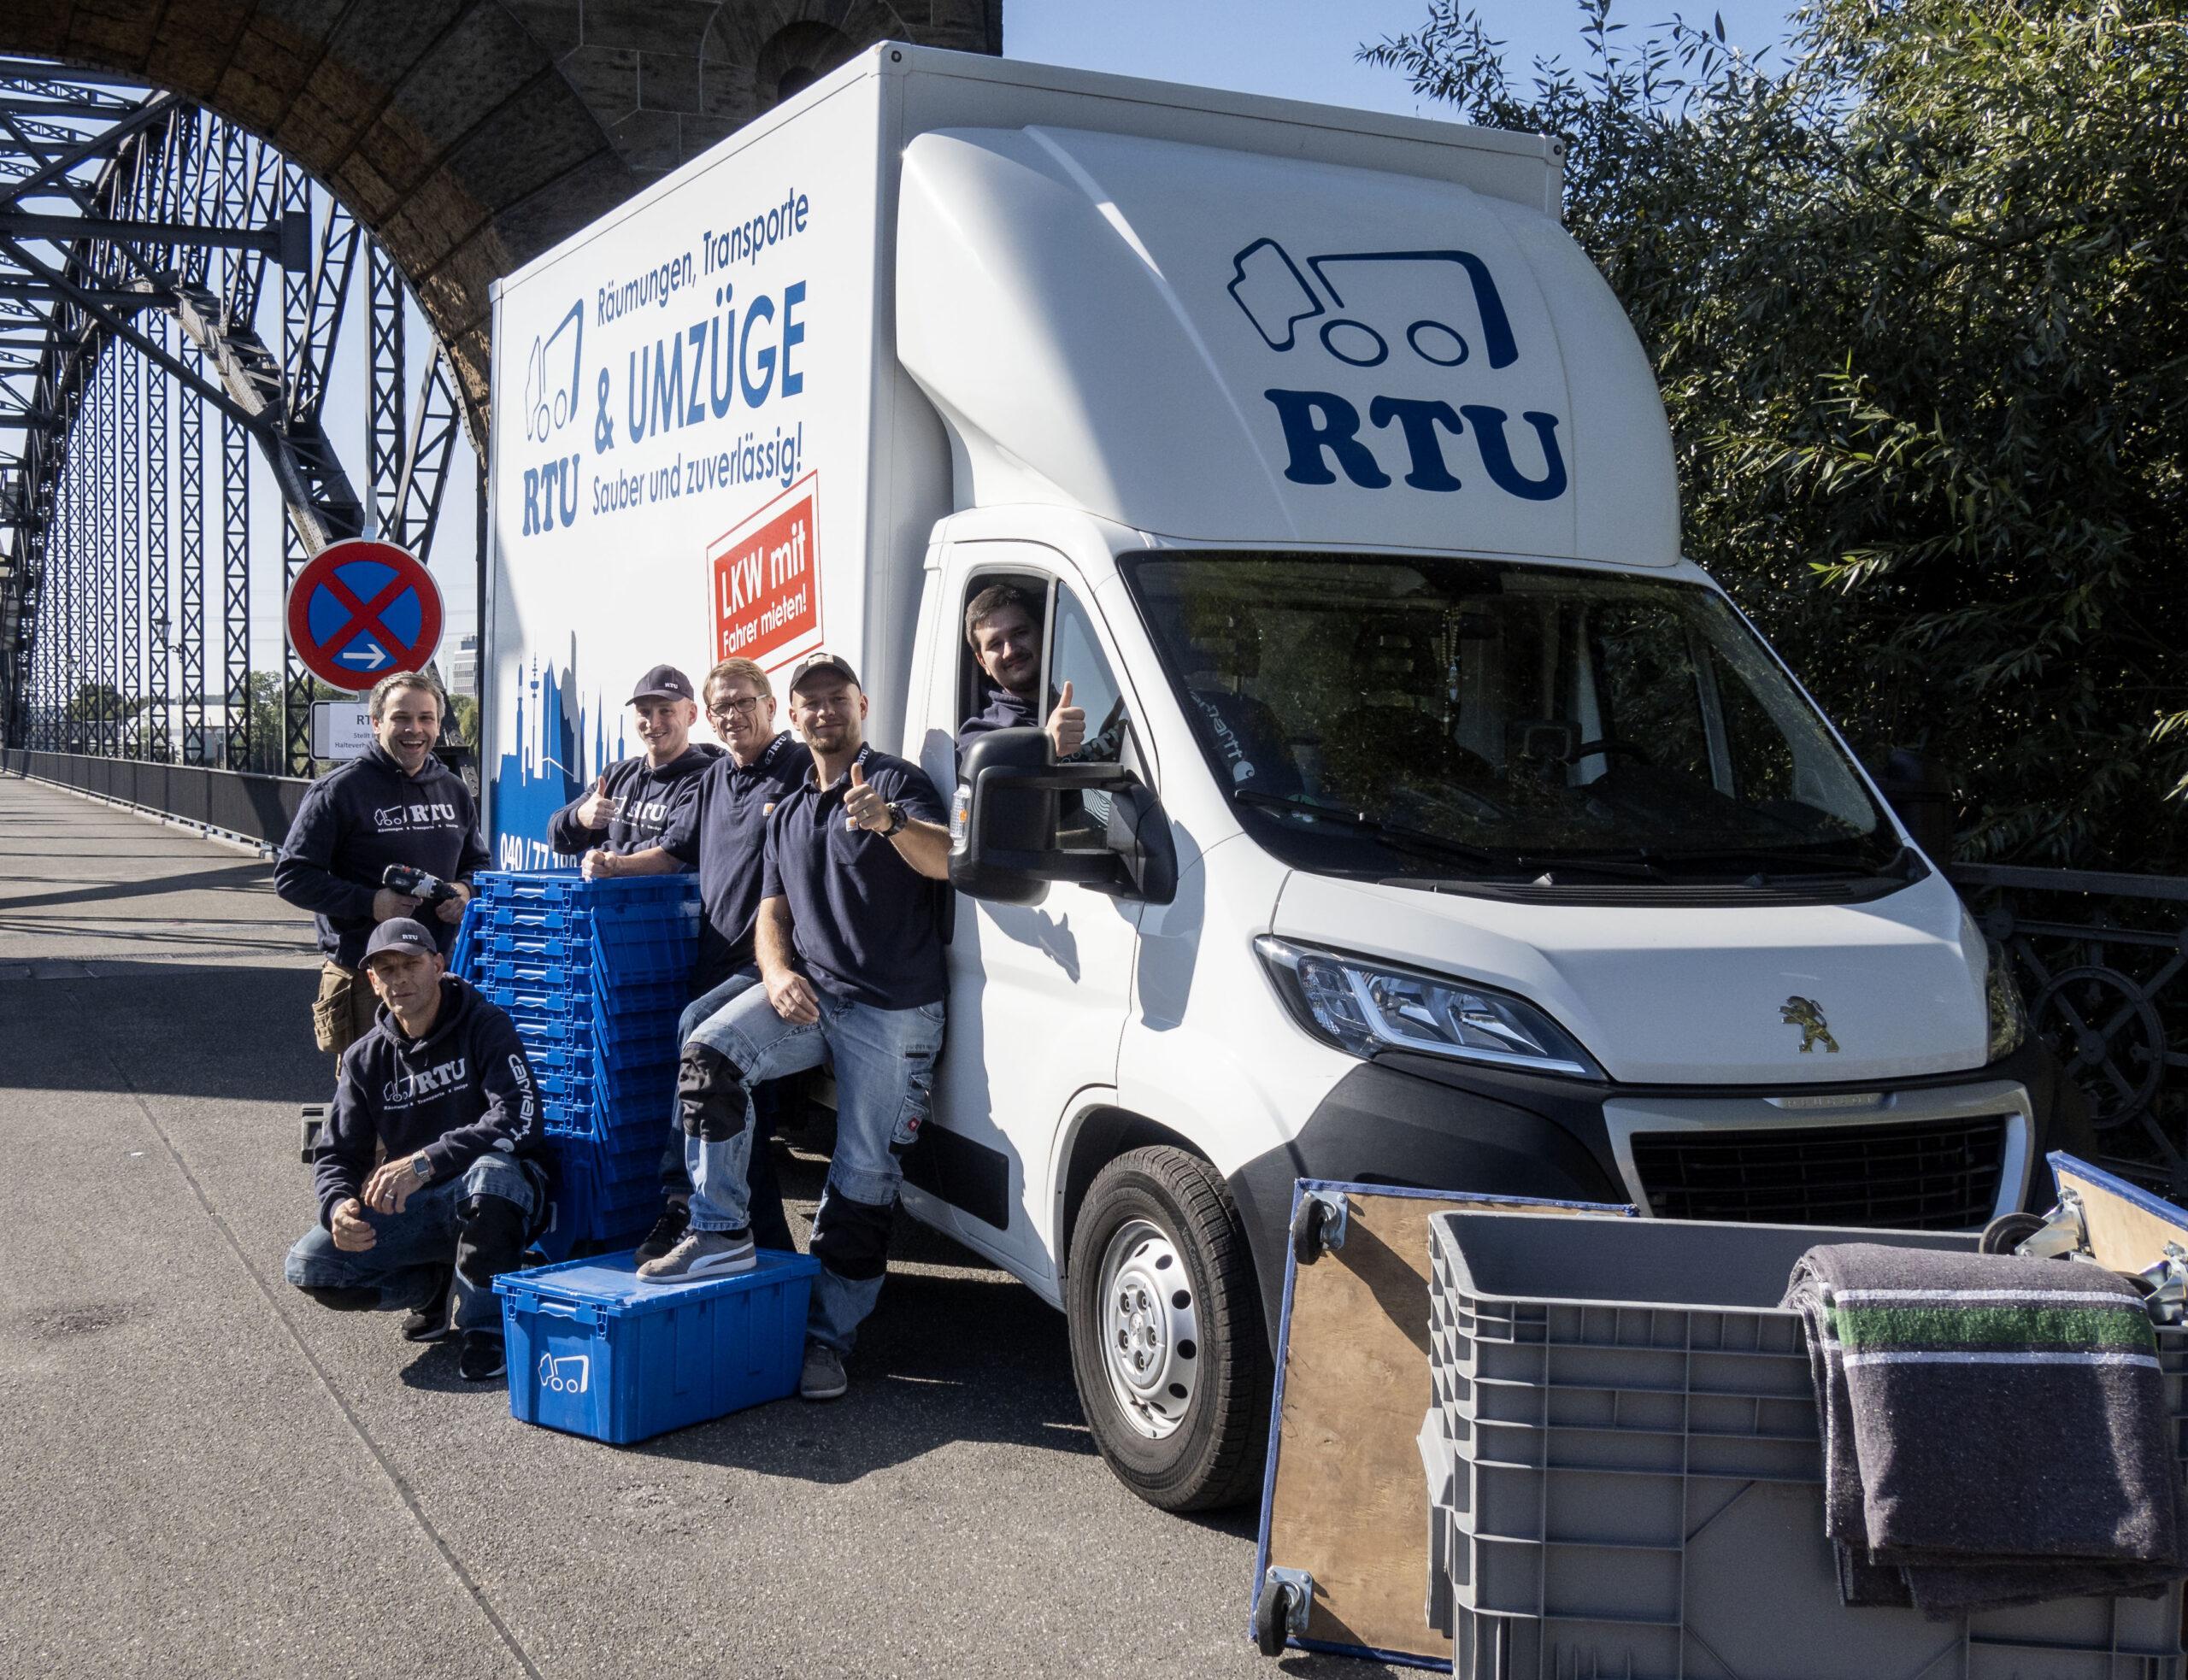 https://www.rtu-hamburg.de/wp-content/uploads/2020/10/Umzugsservice-Hamburg-Team-RTU-scaled.jpg